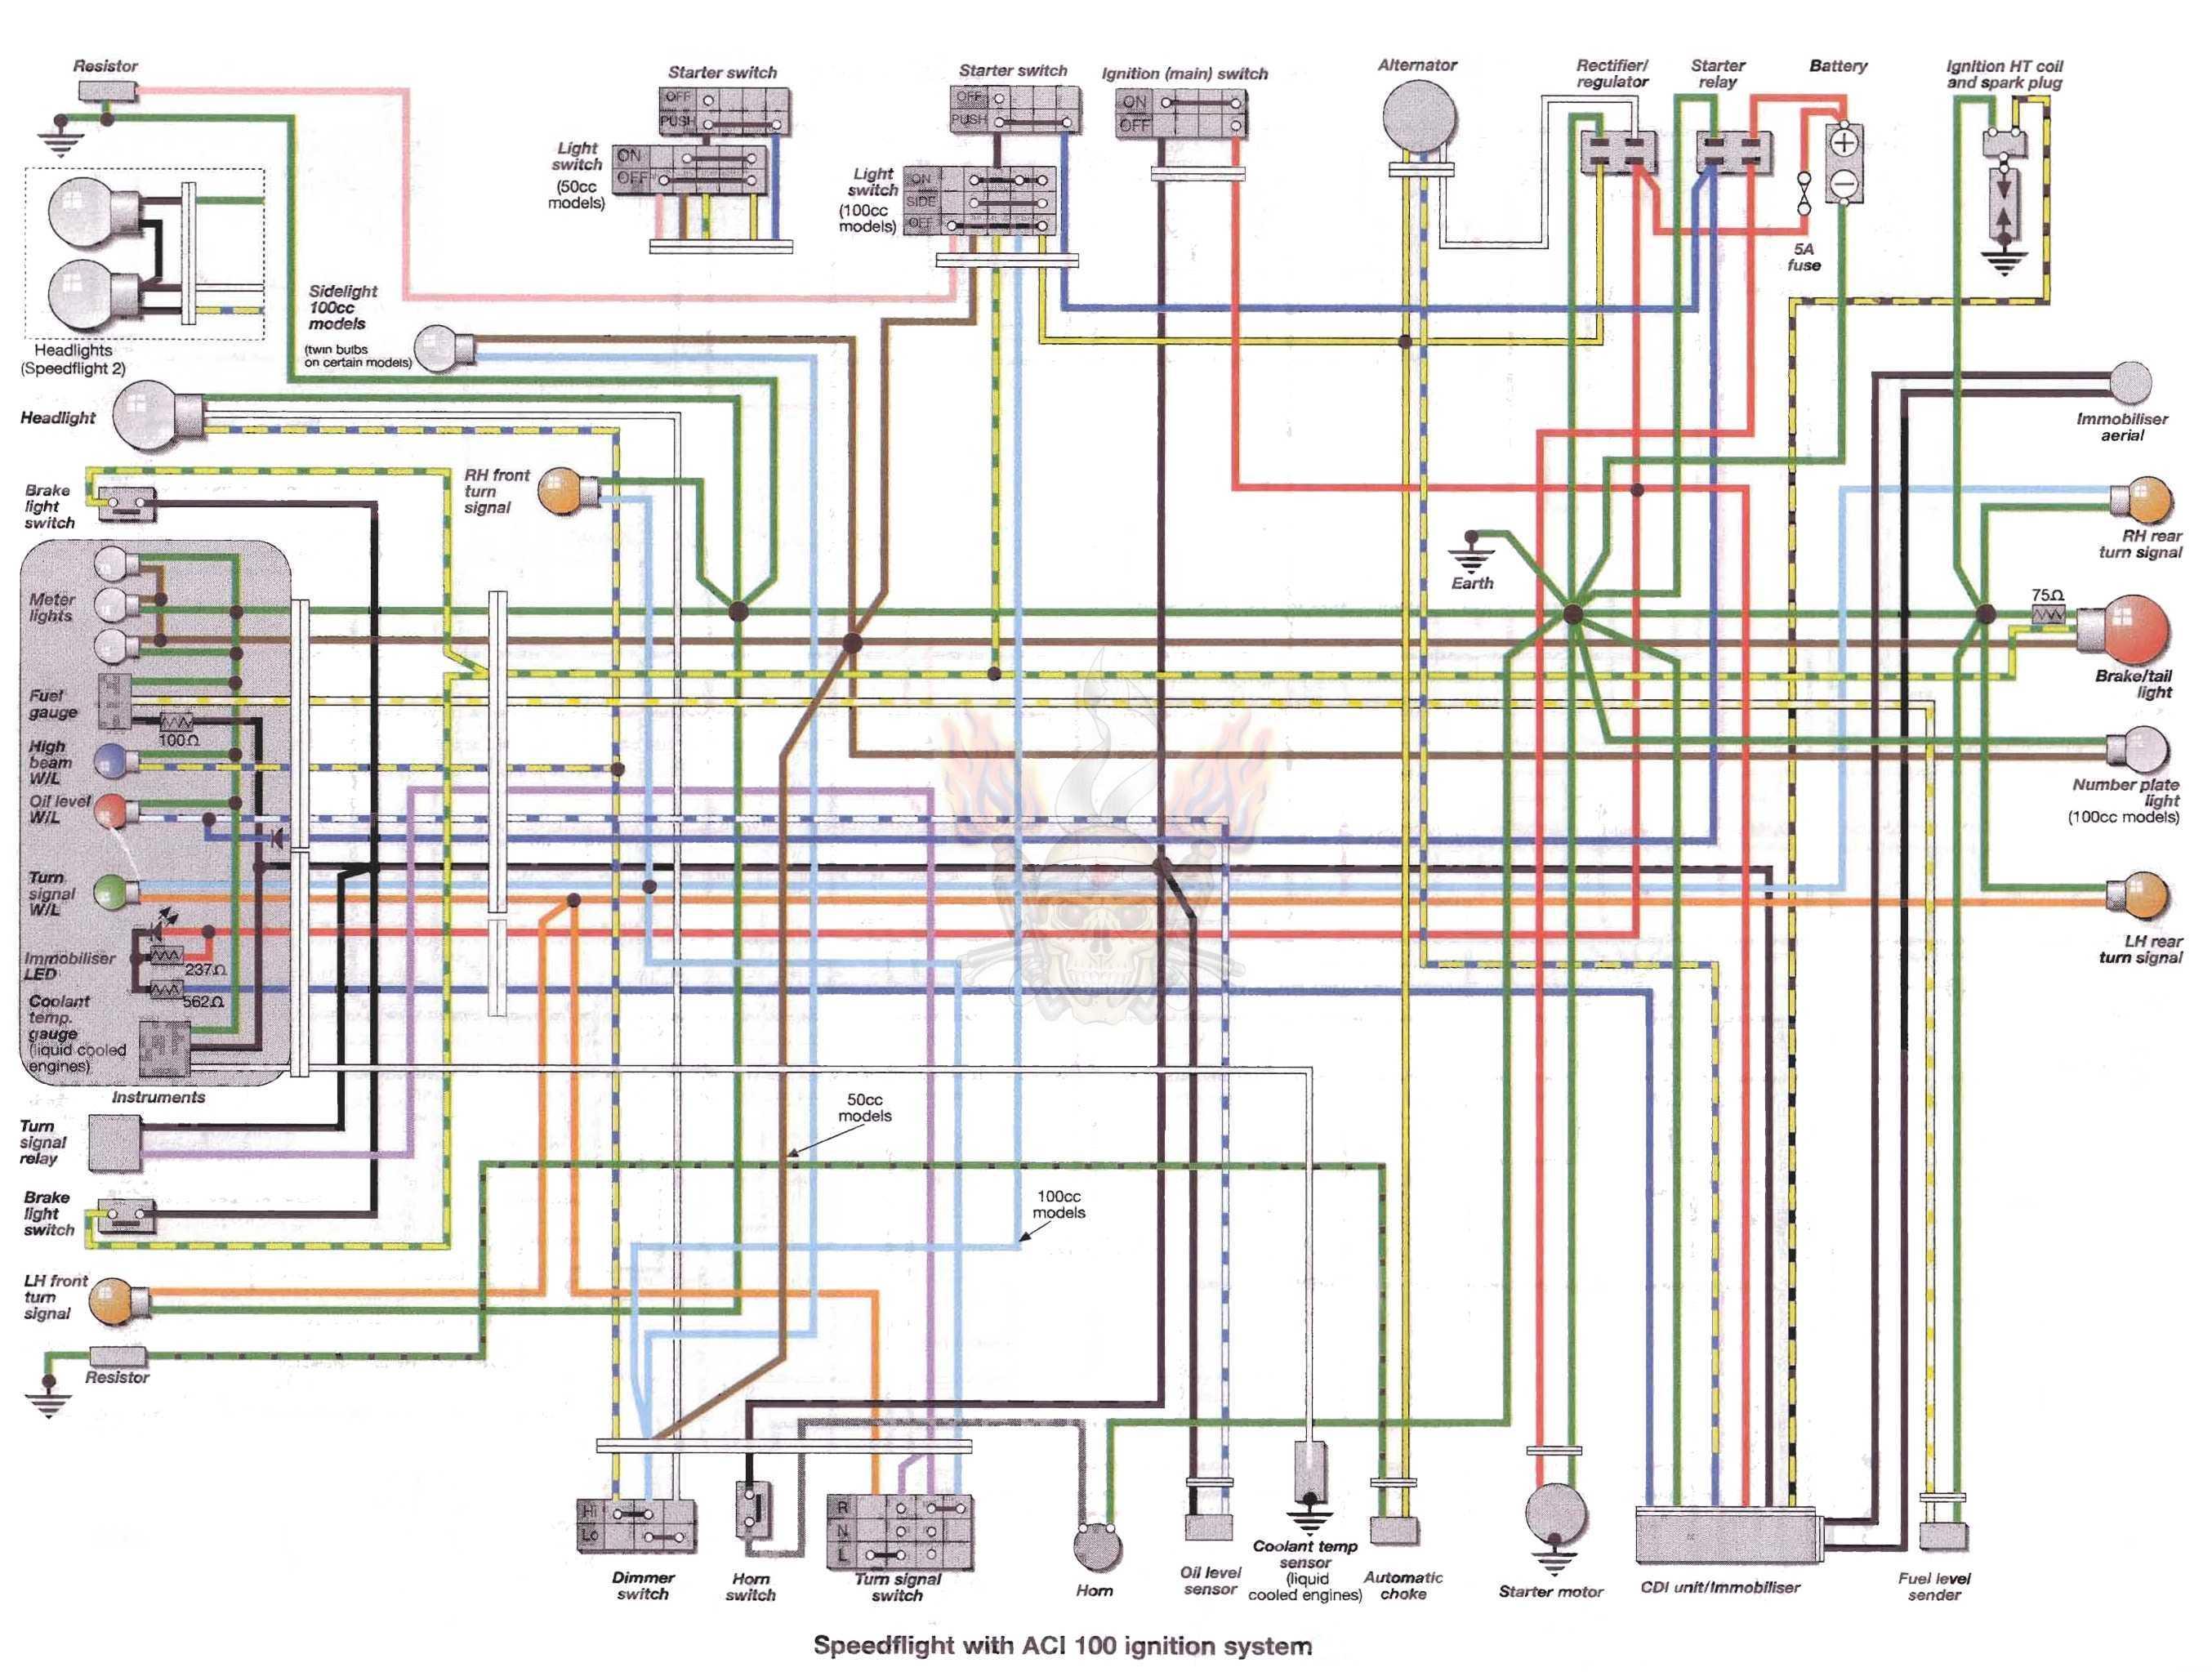 Amazing Peugeot Vivacity 100 Wiring Diagram General Wiring Diagram Data Wiring Digital Resources Attrlexorcompassionincorg